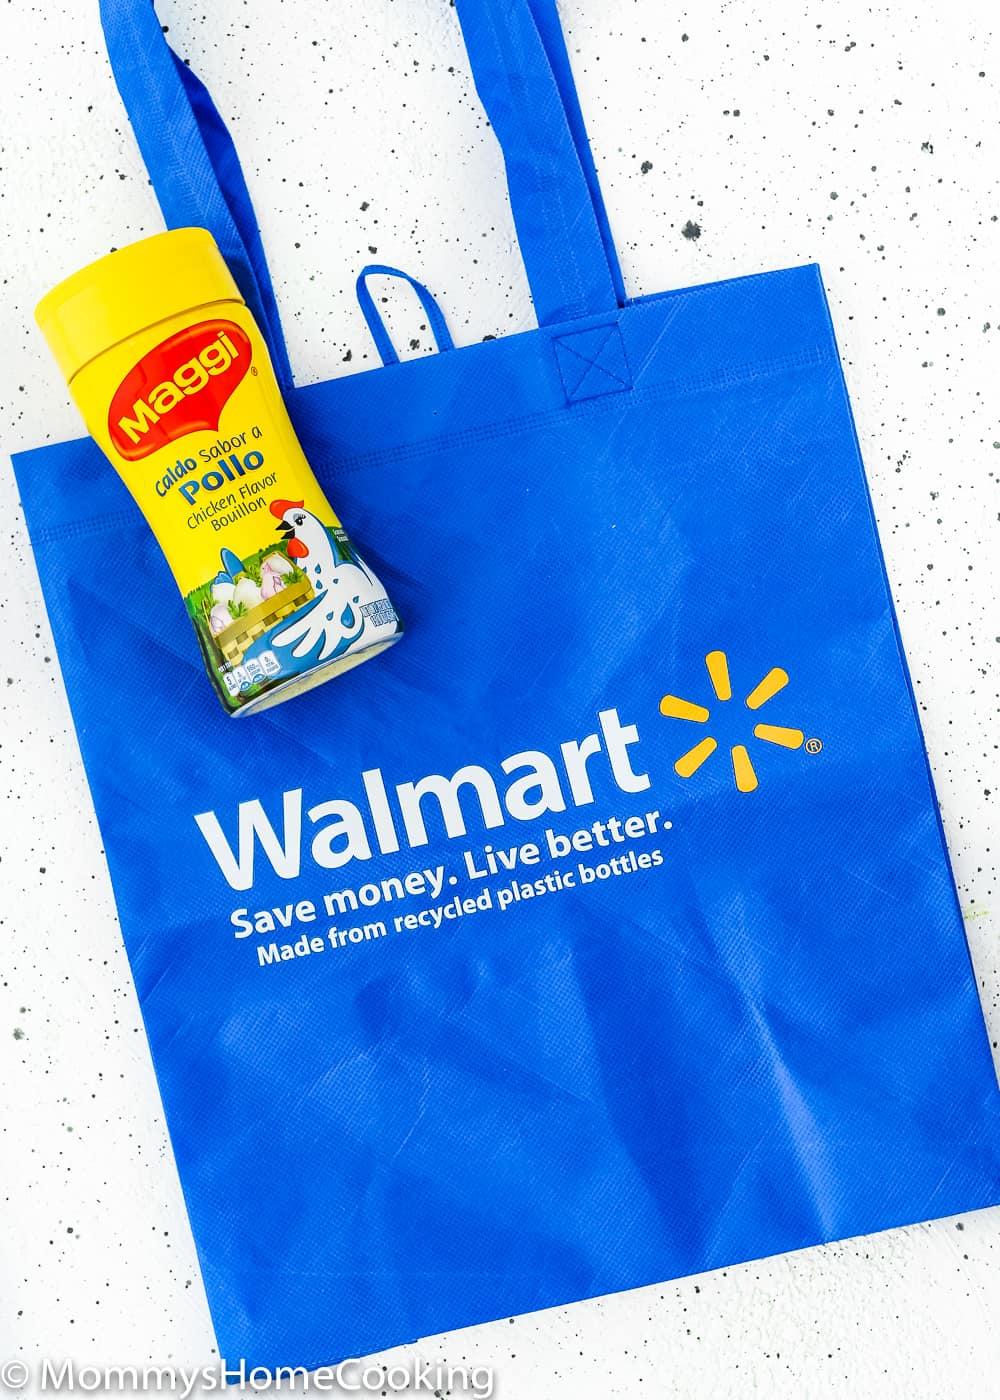 maggi granulated chicken Bouillon with a Walmart bag